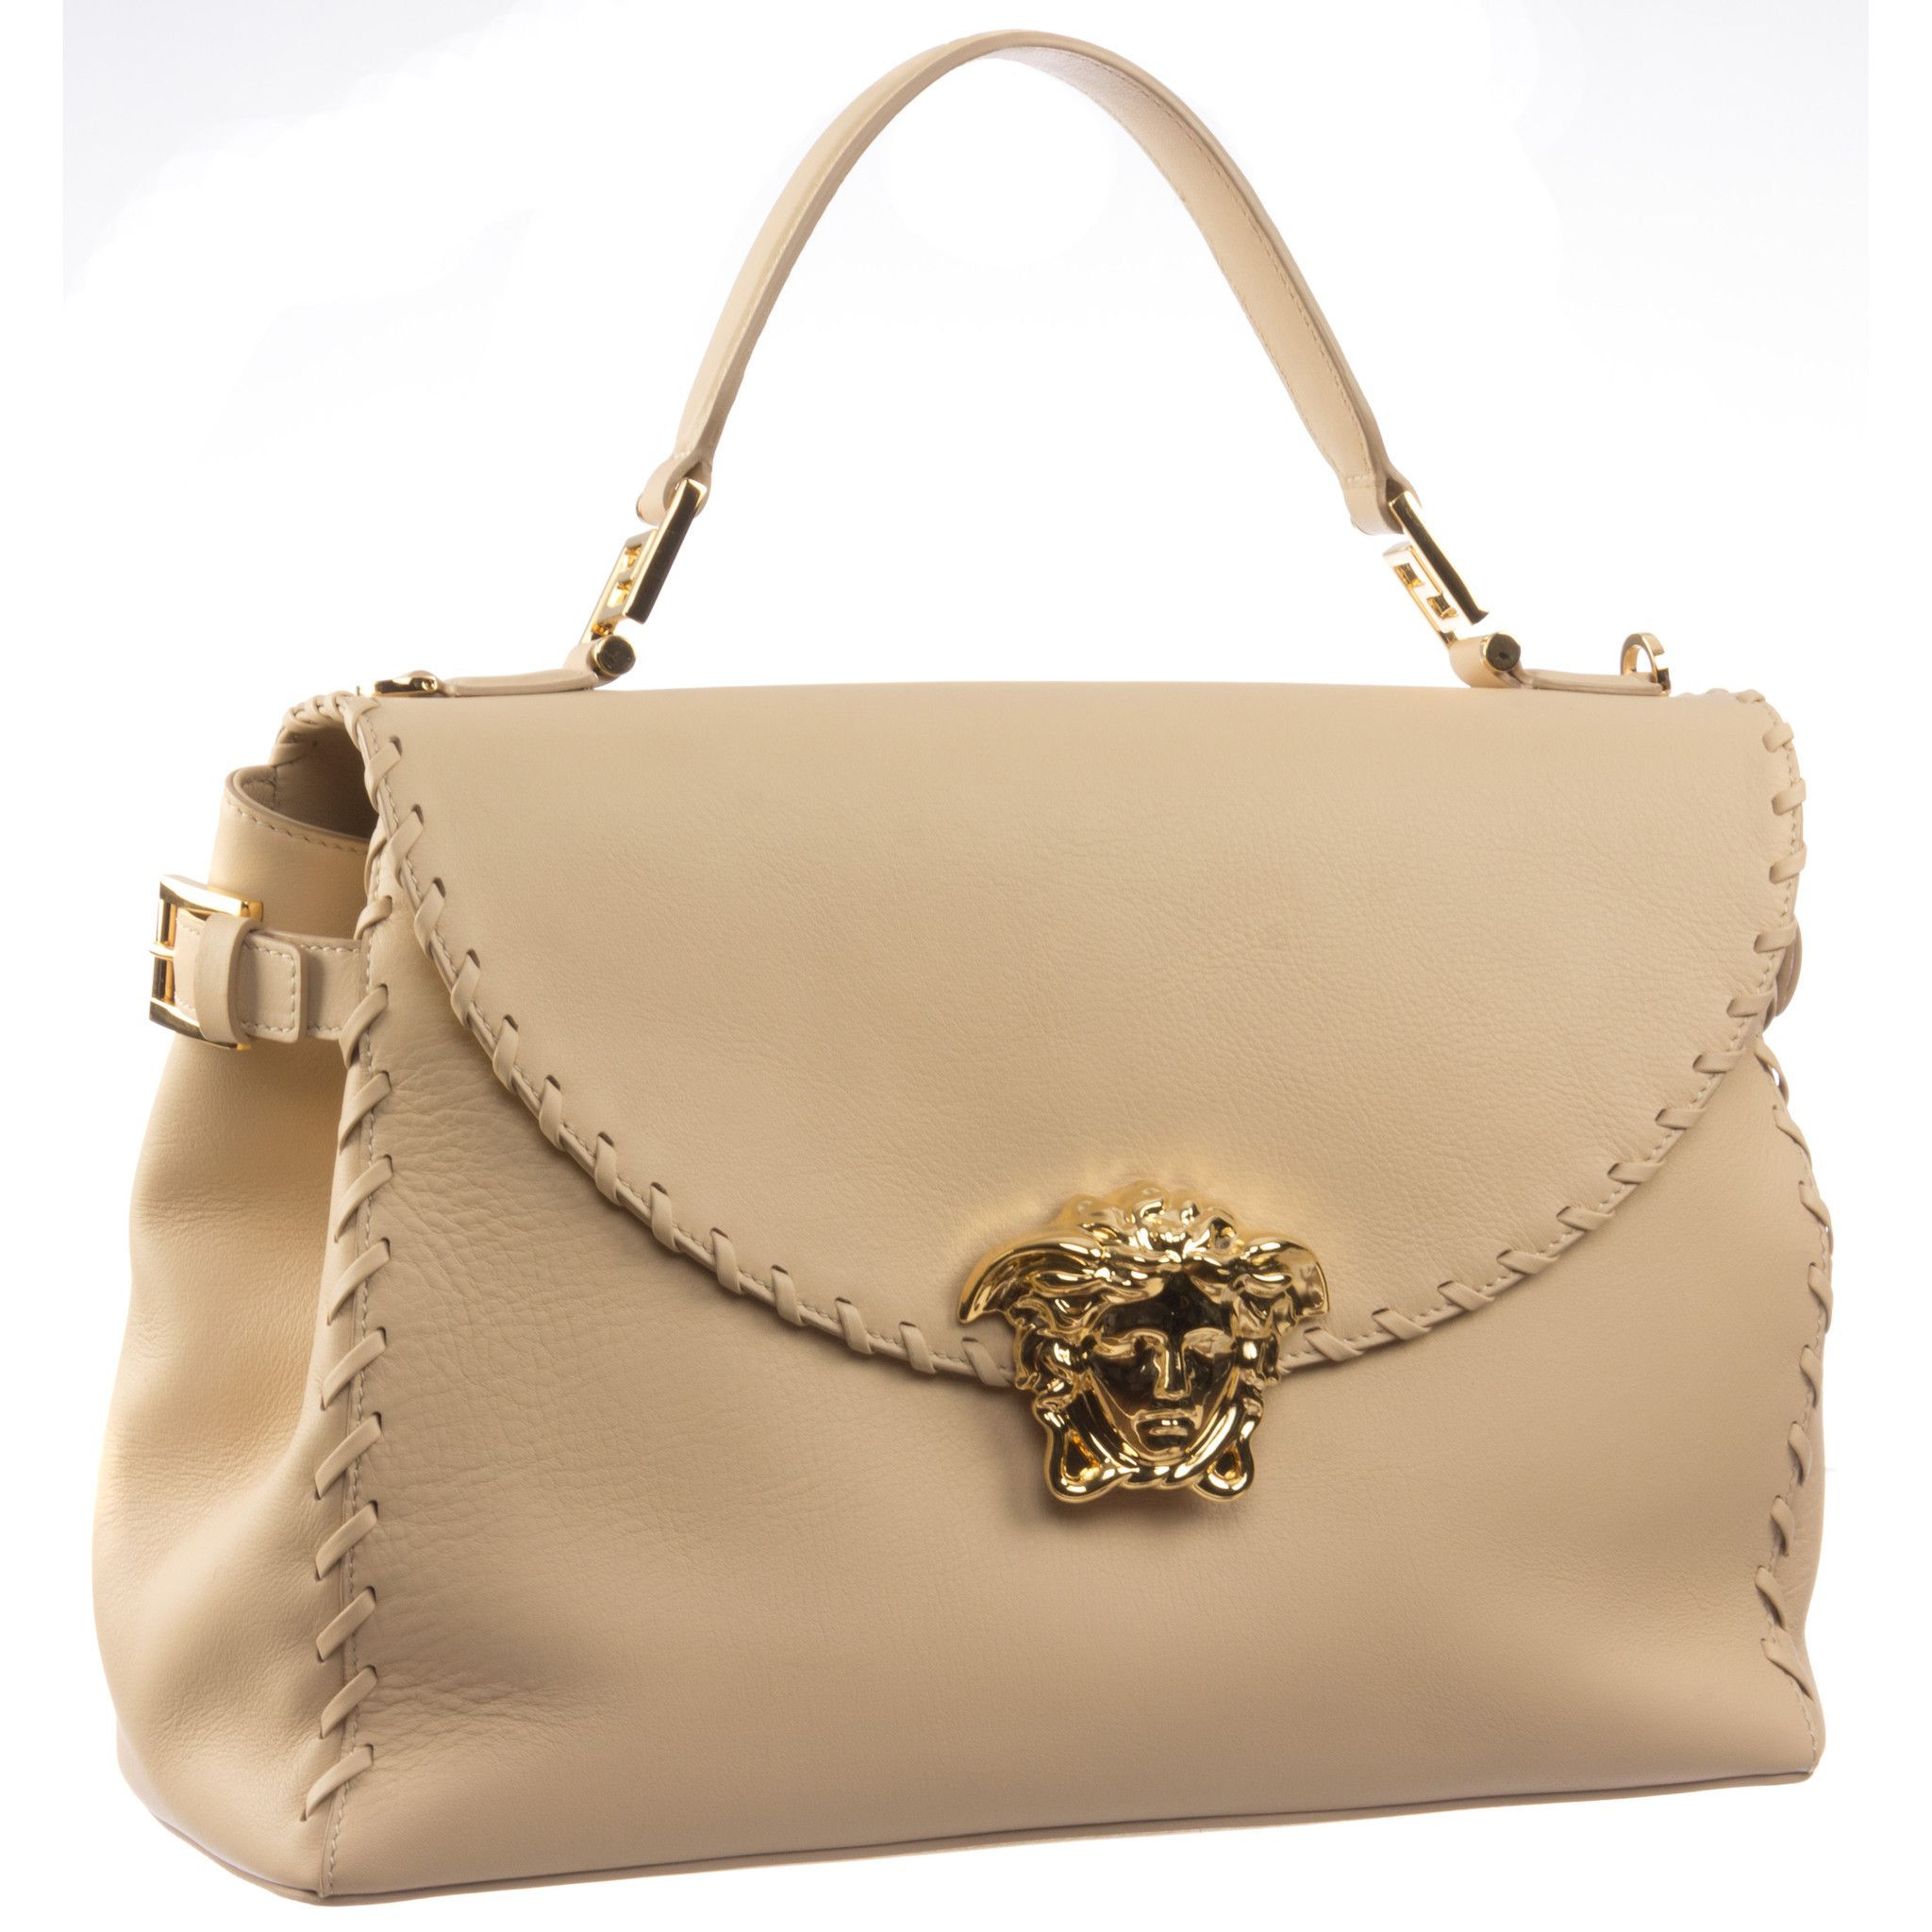 7c99846afcc0 Versace Signature Medusa Lock Leather Handbag-D420H